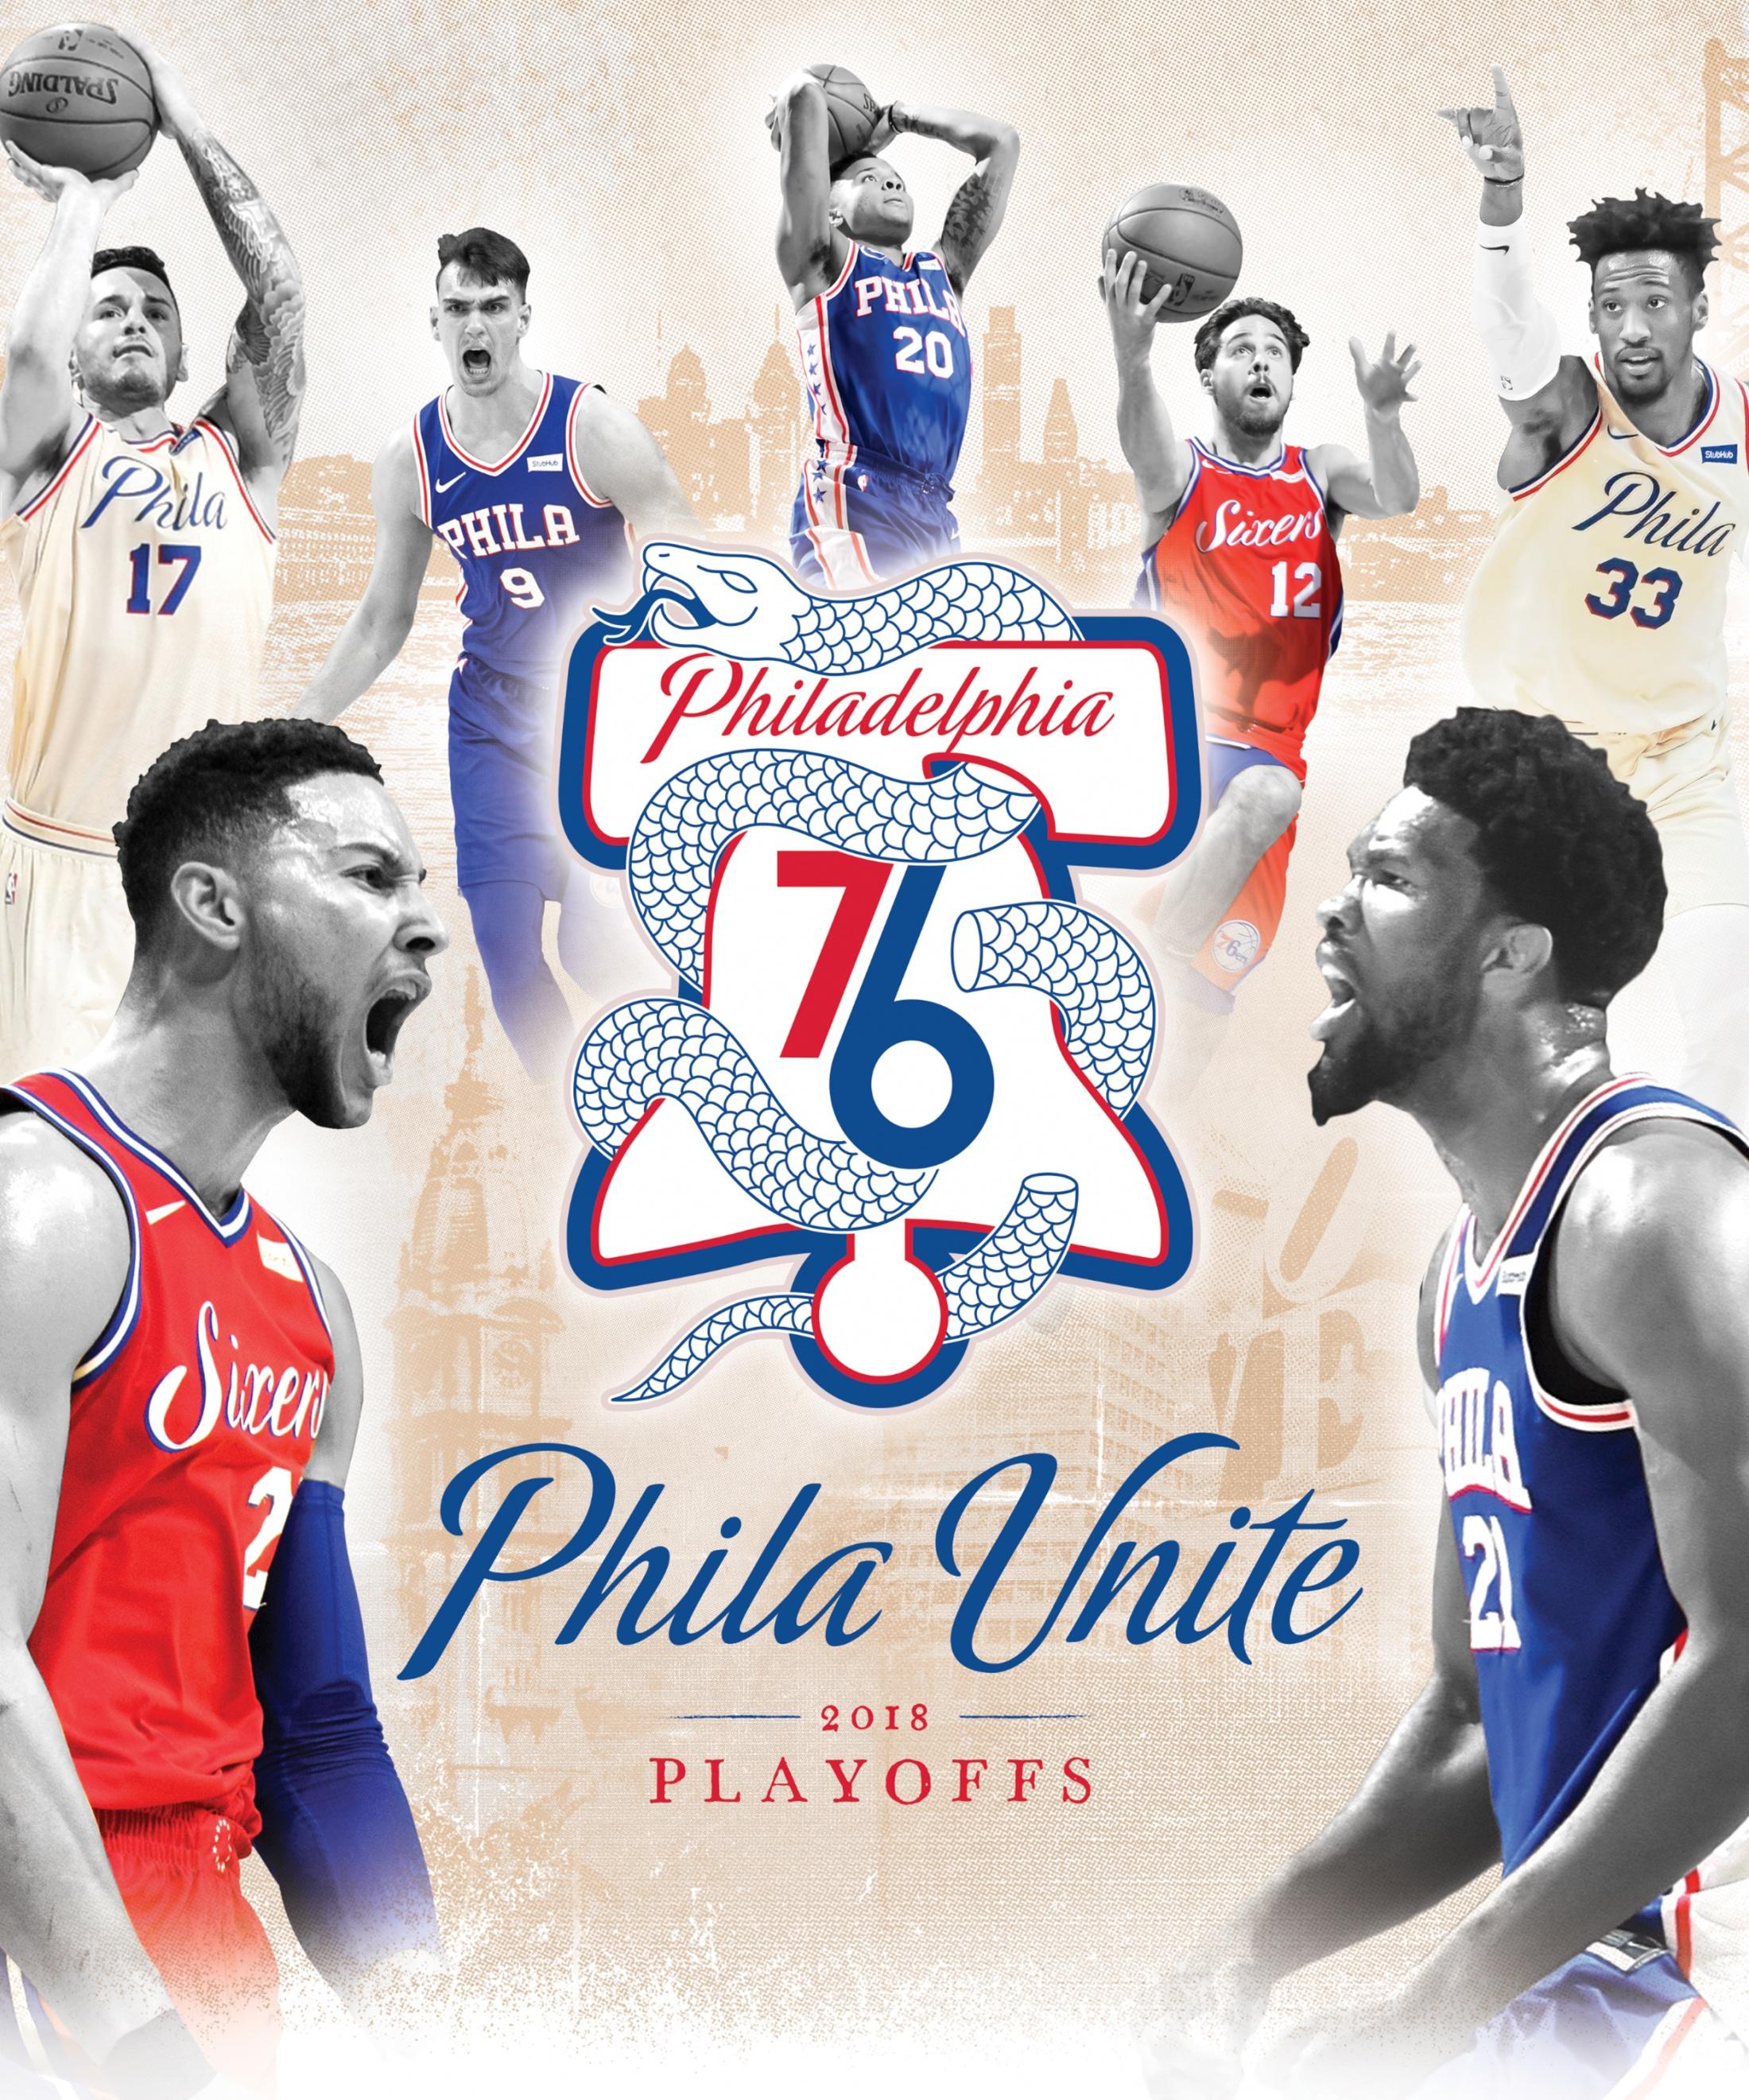 Thumbnail for Philadelphia 76ers - Phila Unite - 2018 Playoff Design